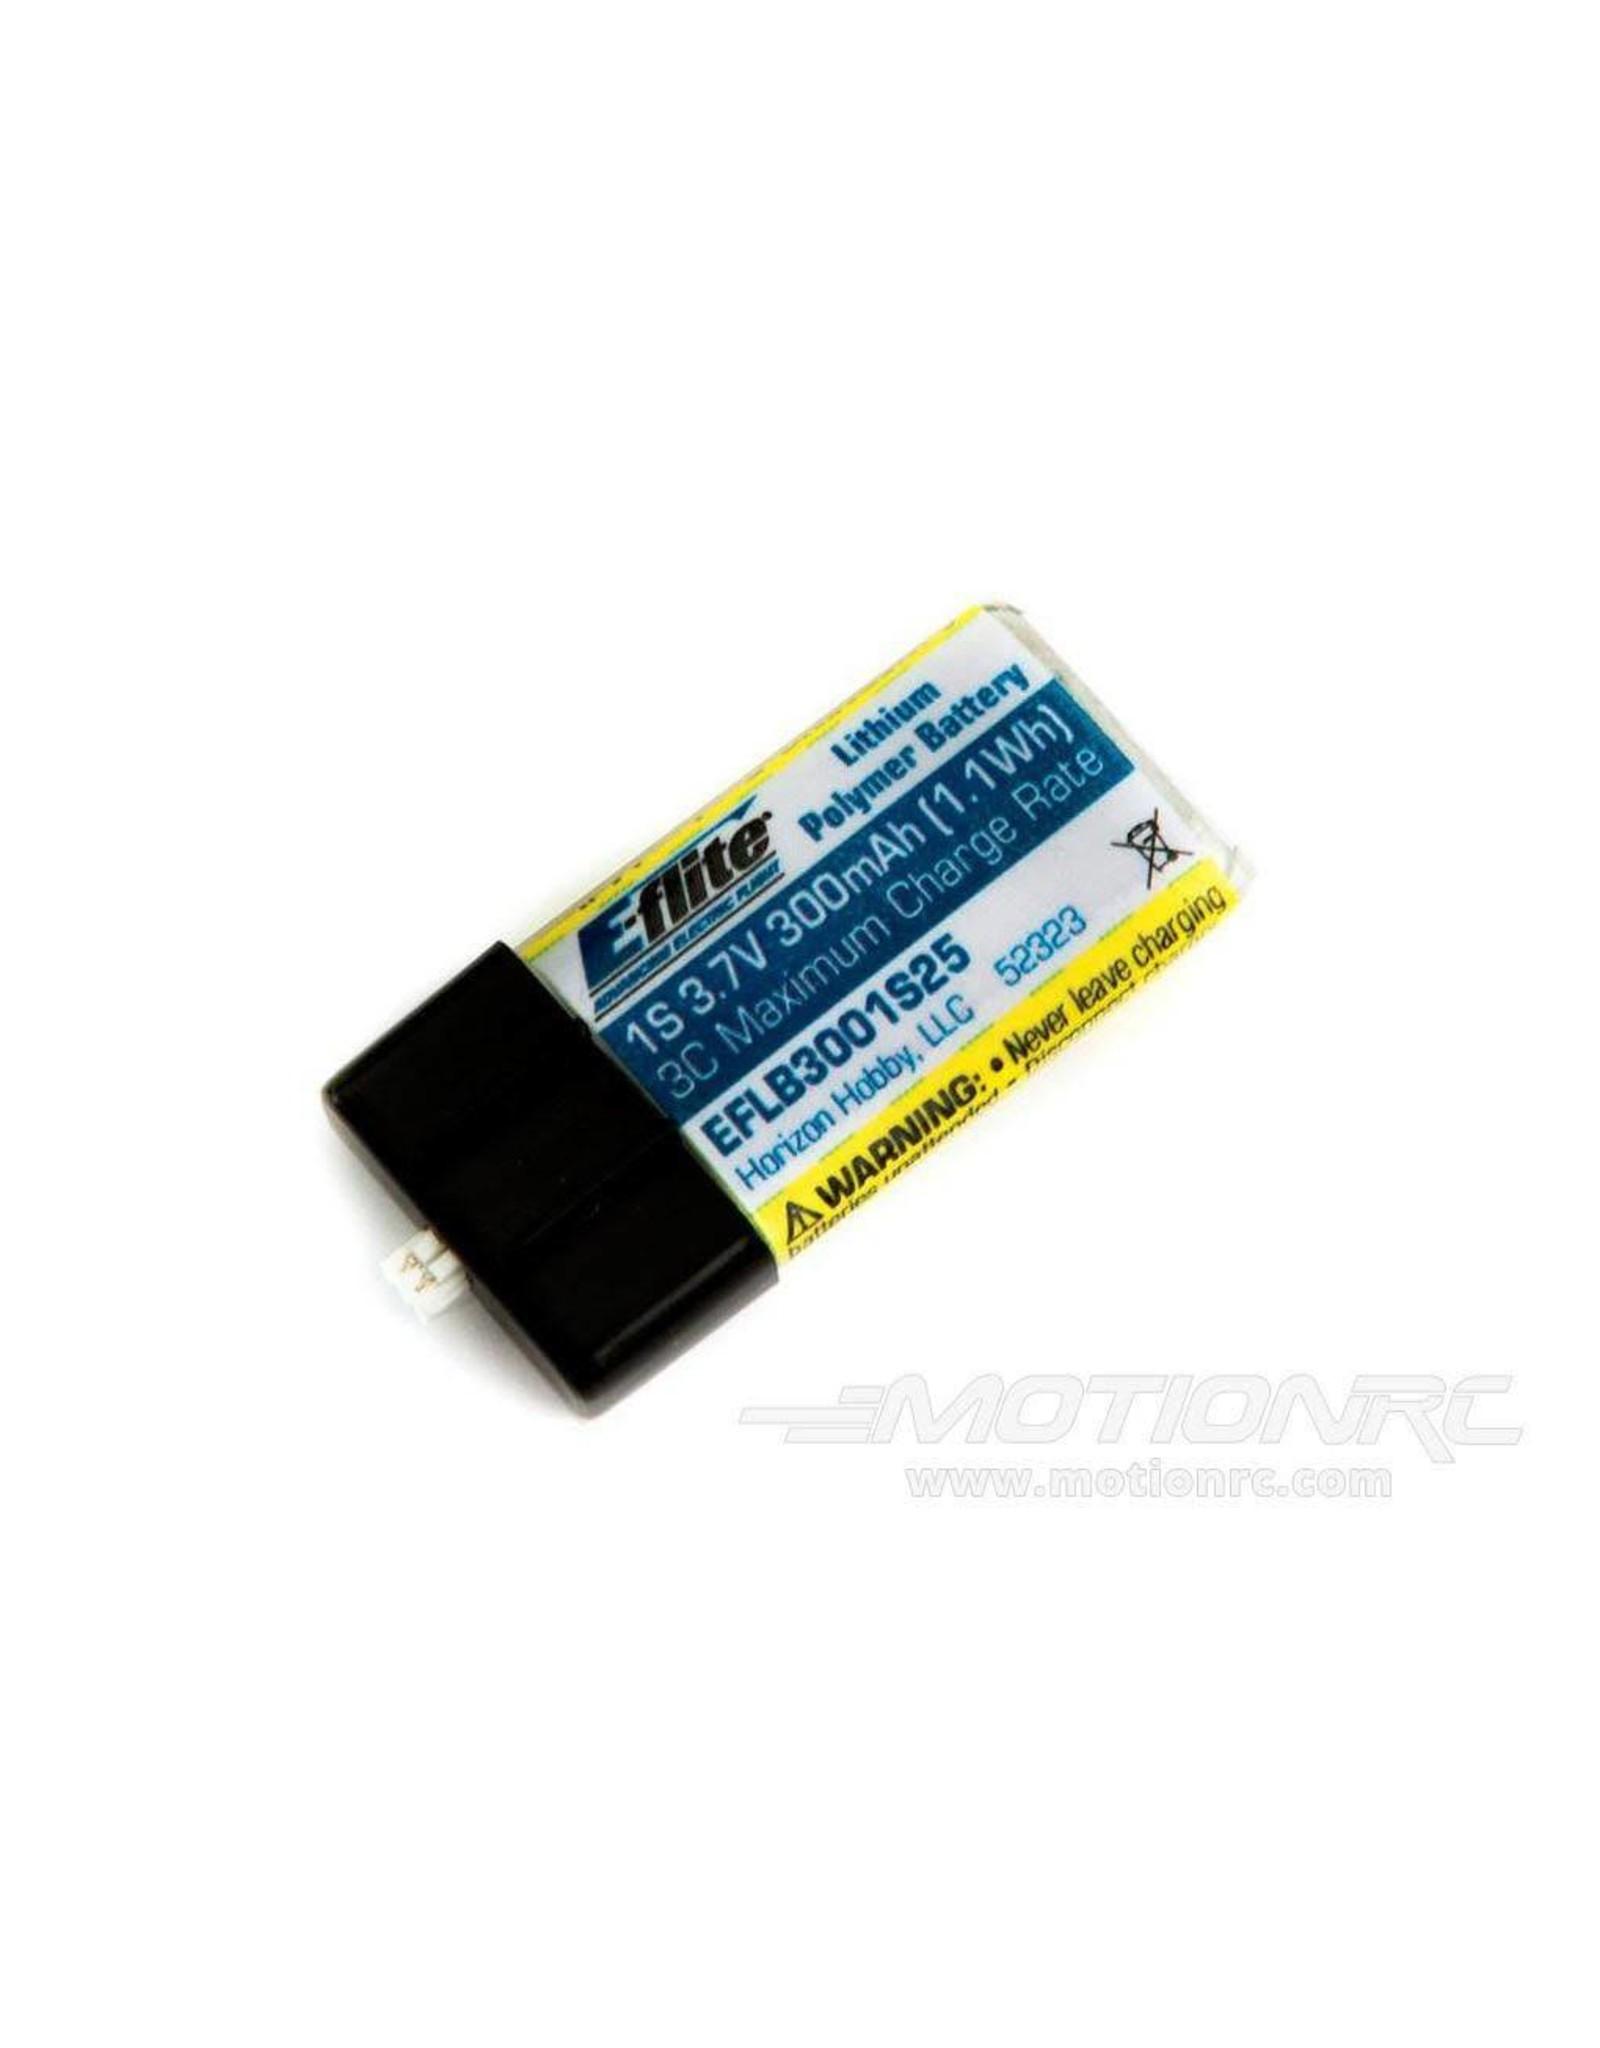 Eflite 300mAh 1S 3.7V 25C LiPo Battery  (EFLB3001S25)